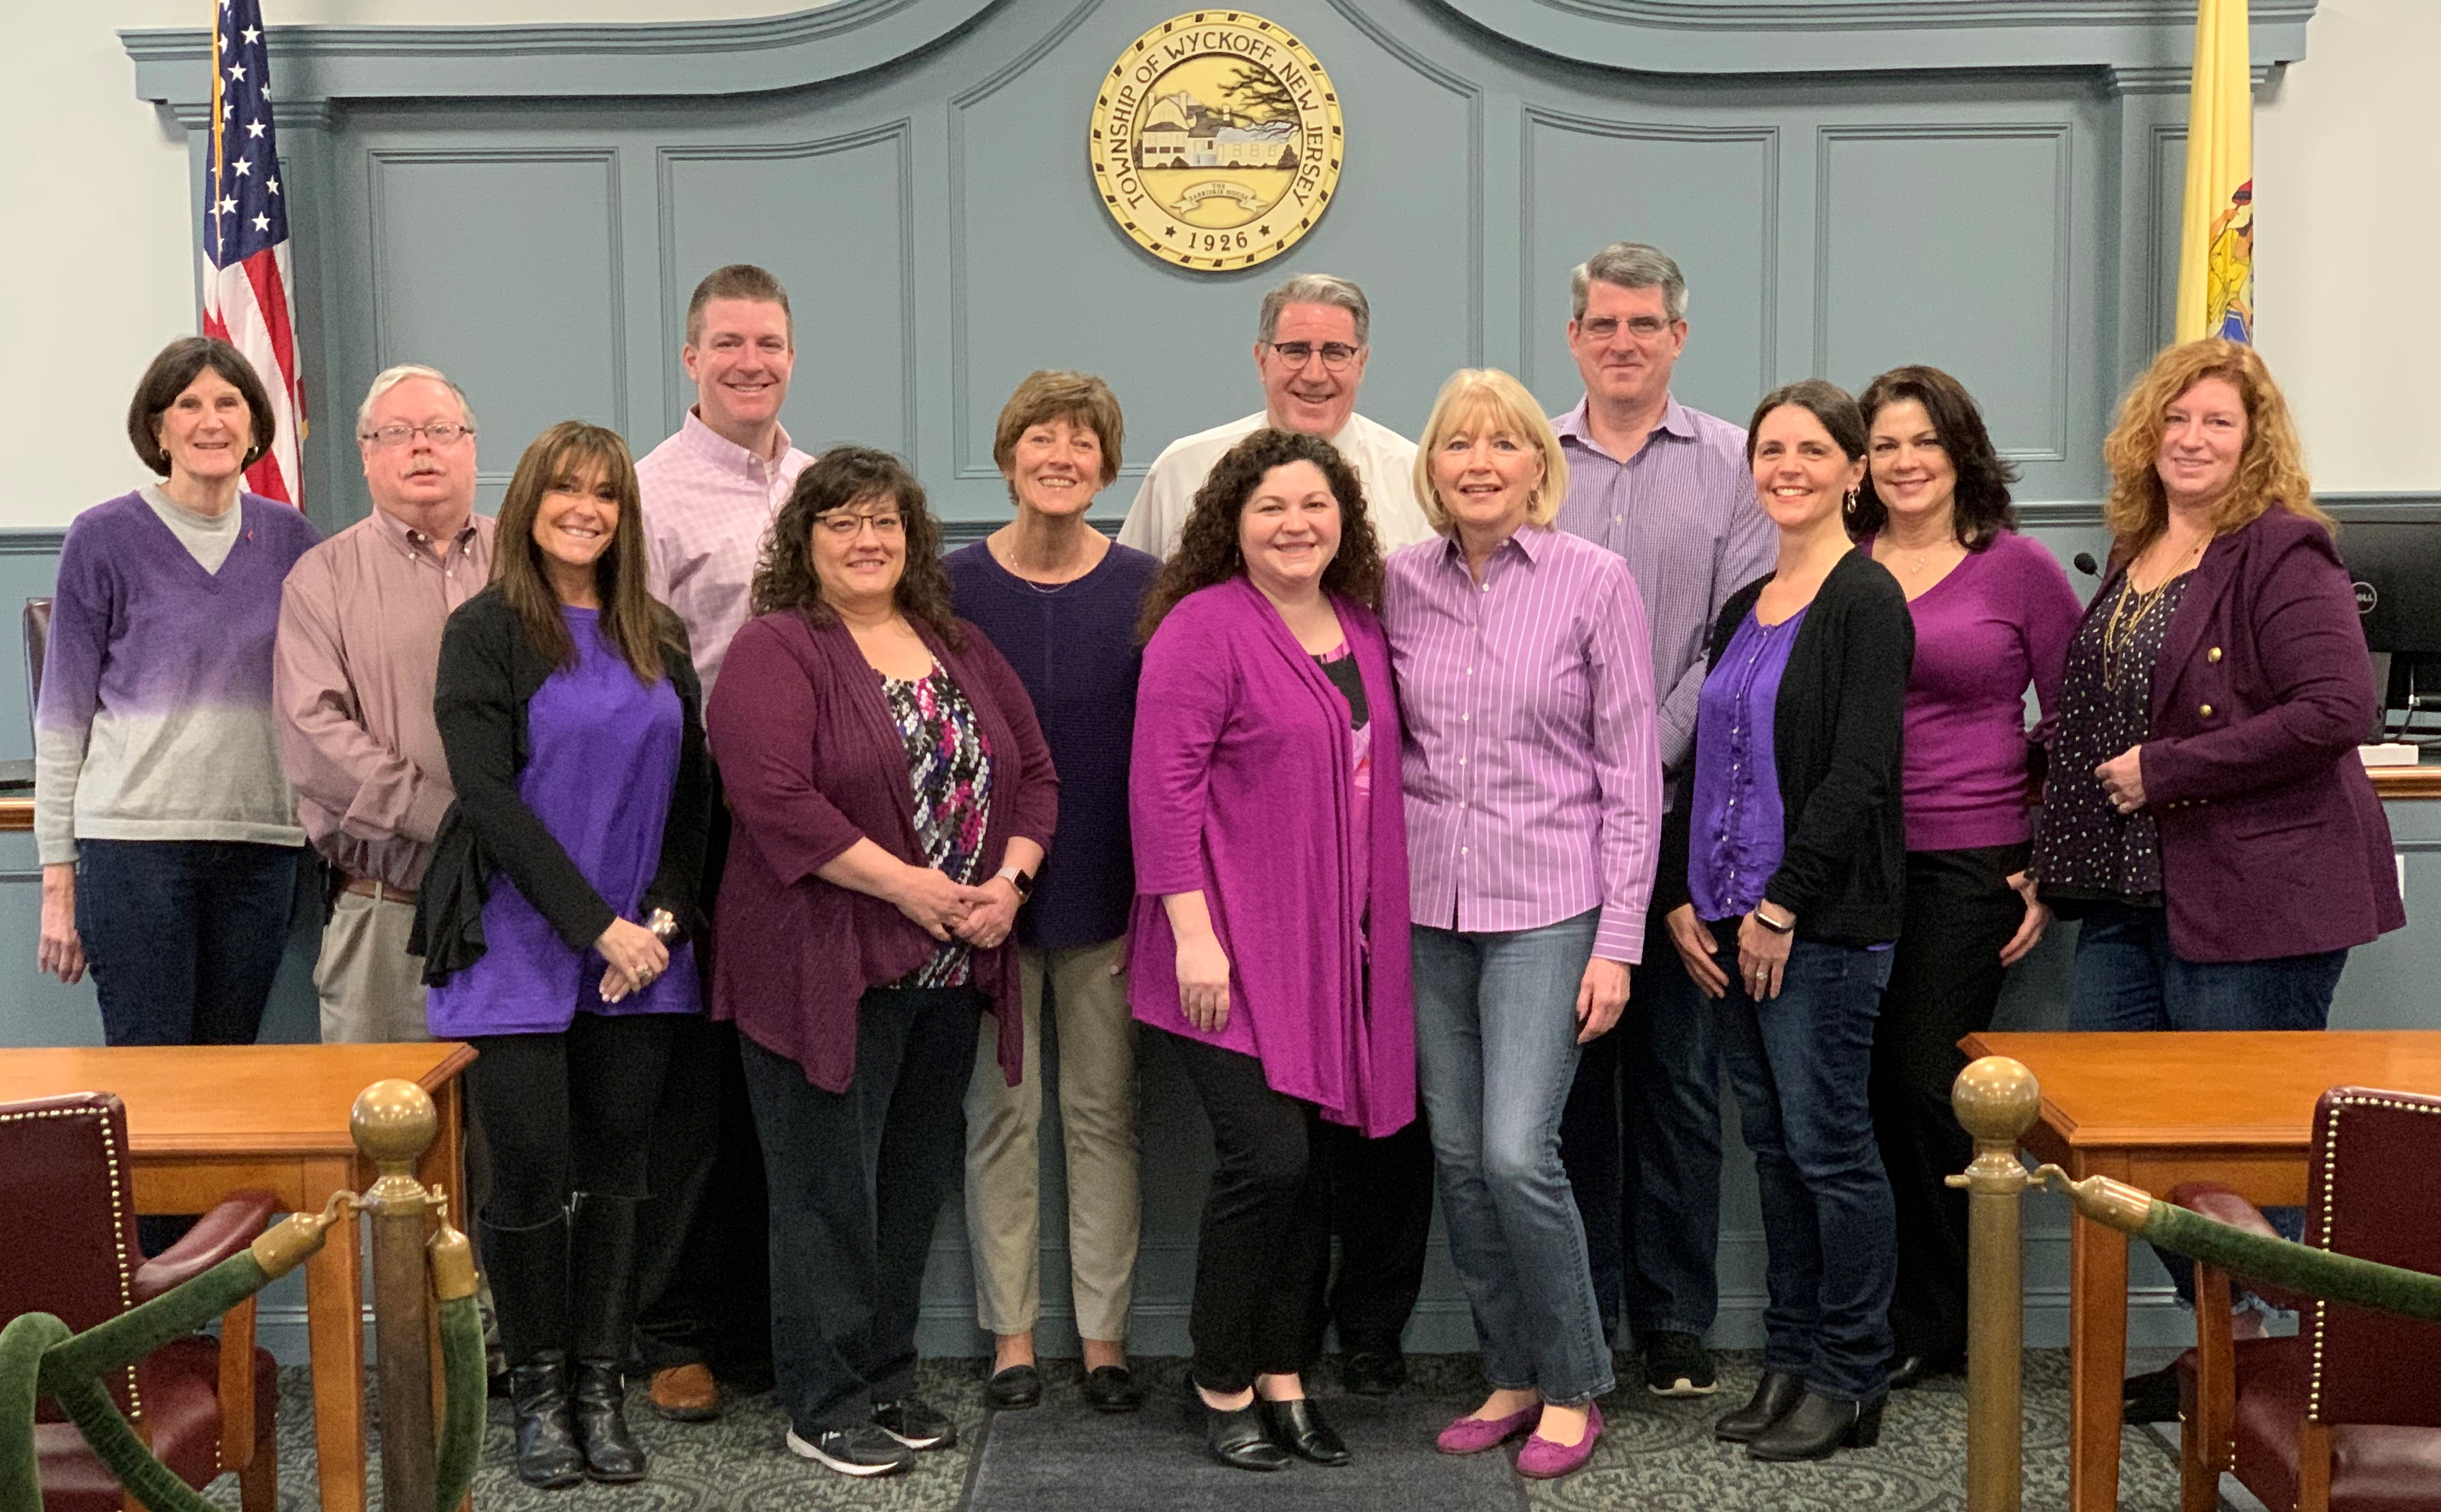 Purple worn to celebrate the 100th anniversary of the 19th amendment